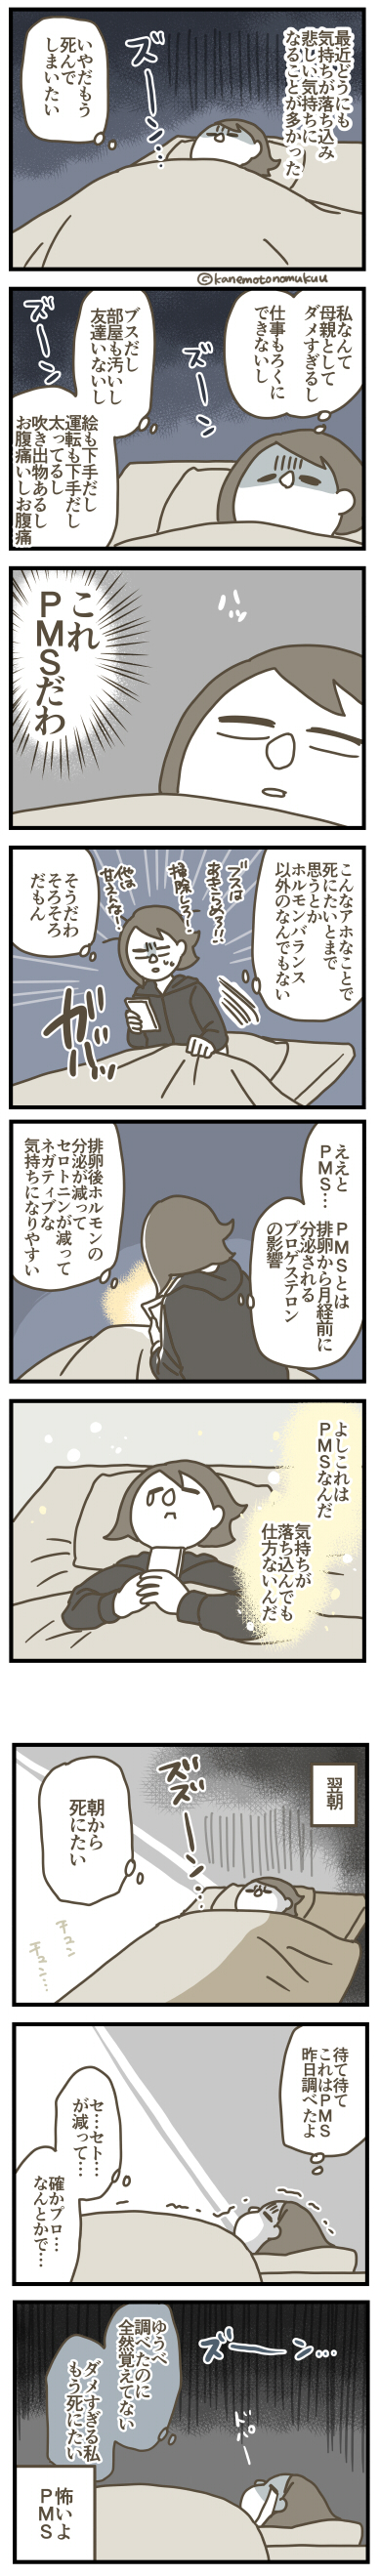 f:id:kanemotonomukuu:20170513235708j:plain